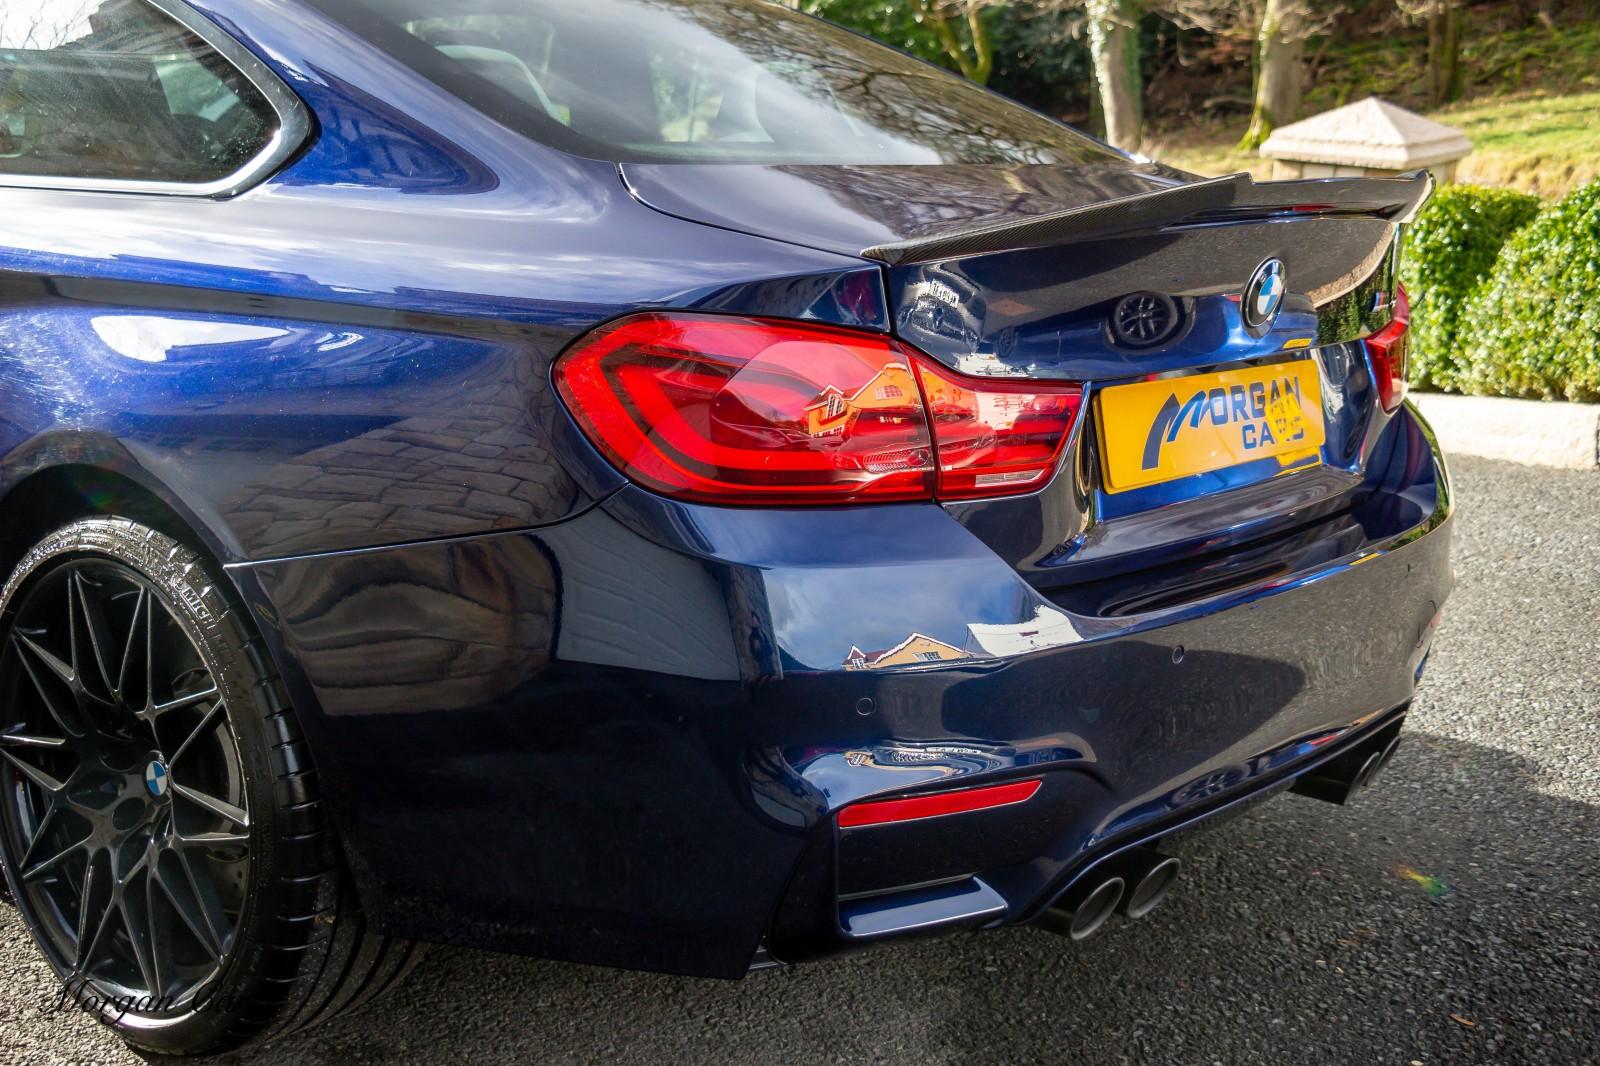 2017 BMW 4 Series M4 COMPETITION Petrol Semi Auto – Morgan Cars 9 Mound Road, Warrenpoint, Newry BT34 3LW, UK full